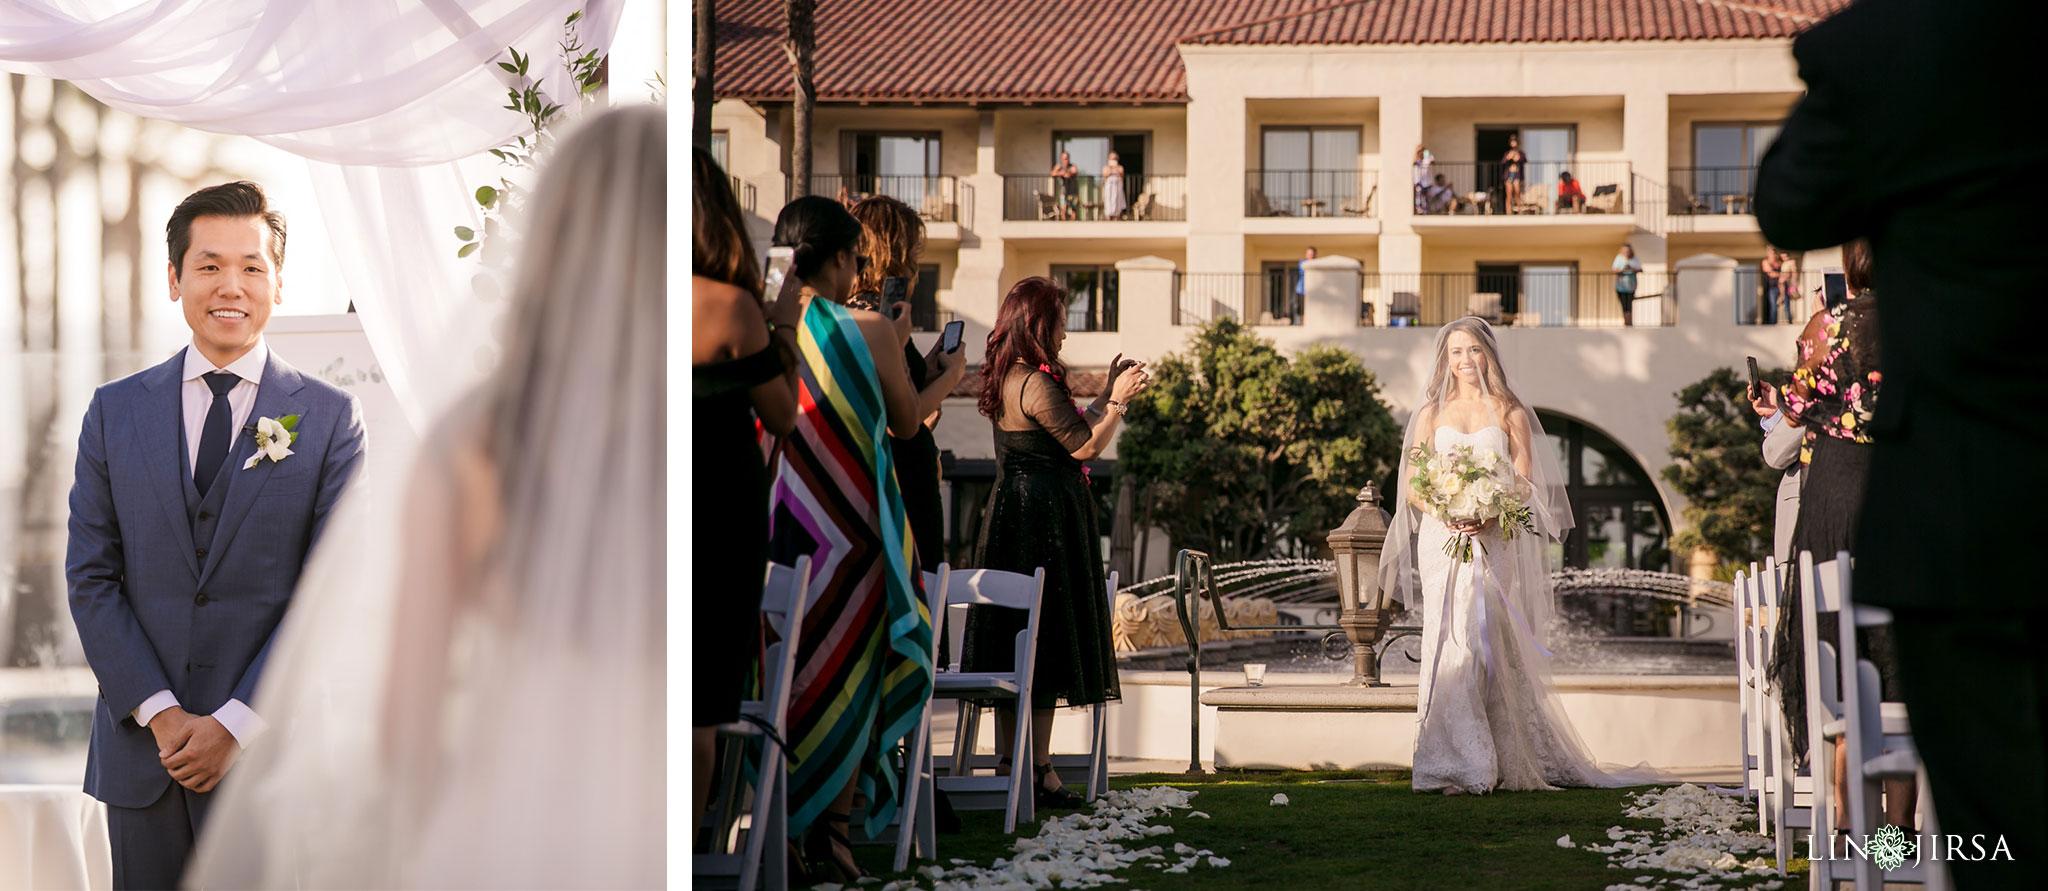 24 hyatt regency huntington beach wedding photography